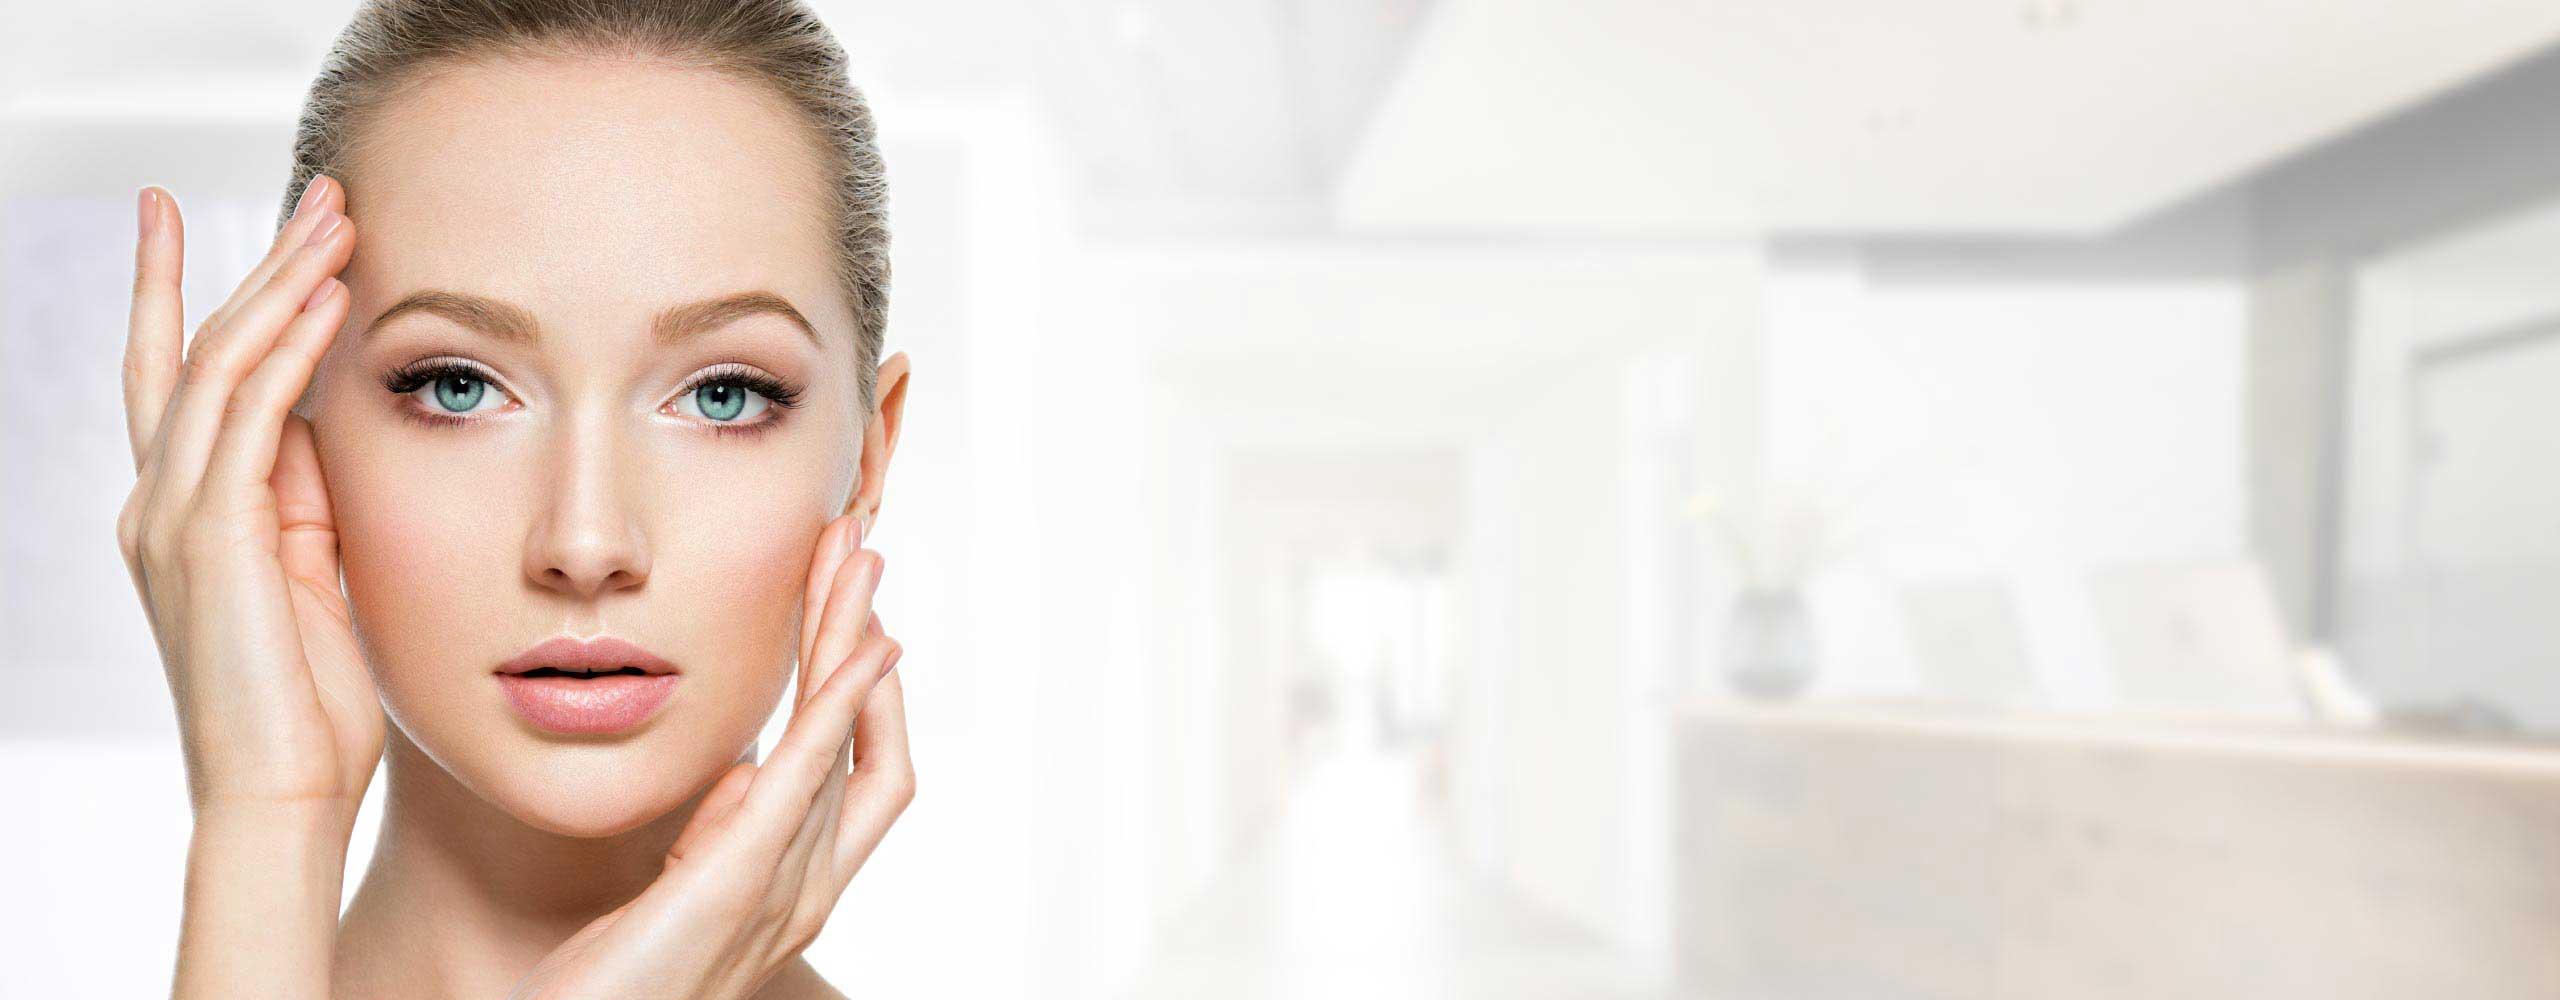 faltenunterspritzung faltenbehandlung hyaluron schoenheitsklinik proaesthetic header